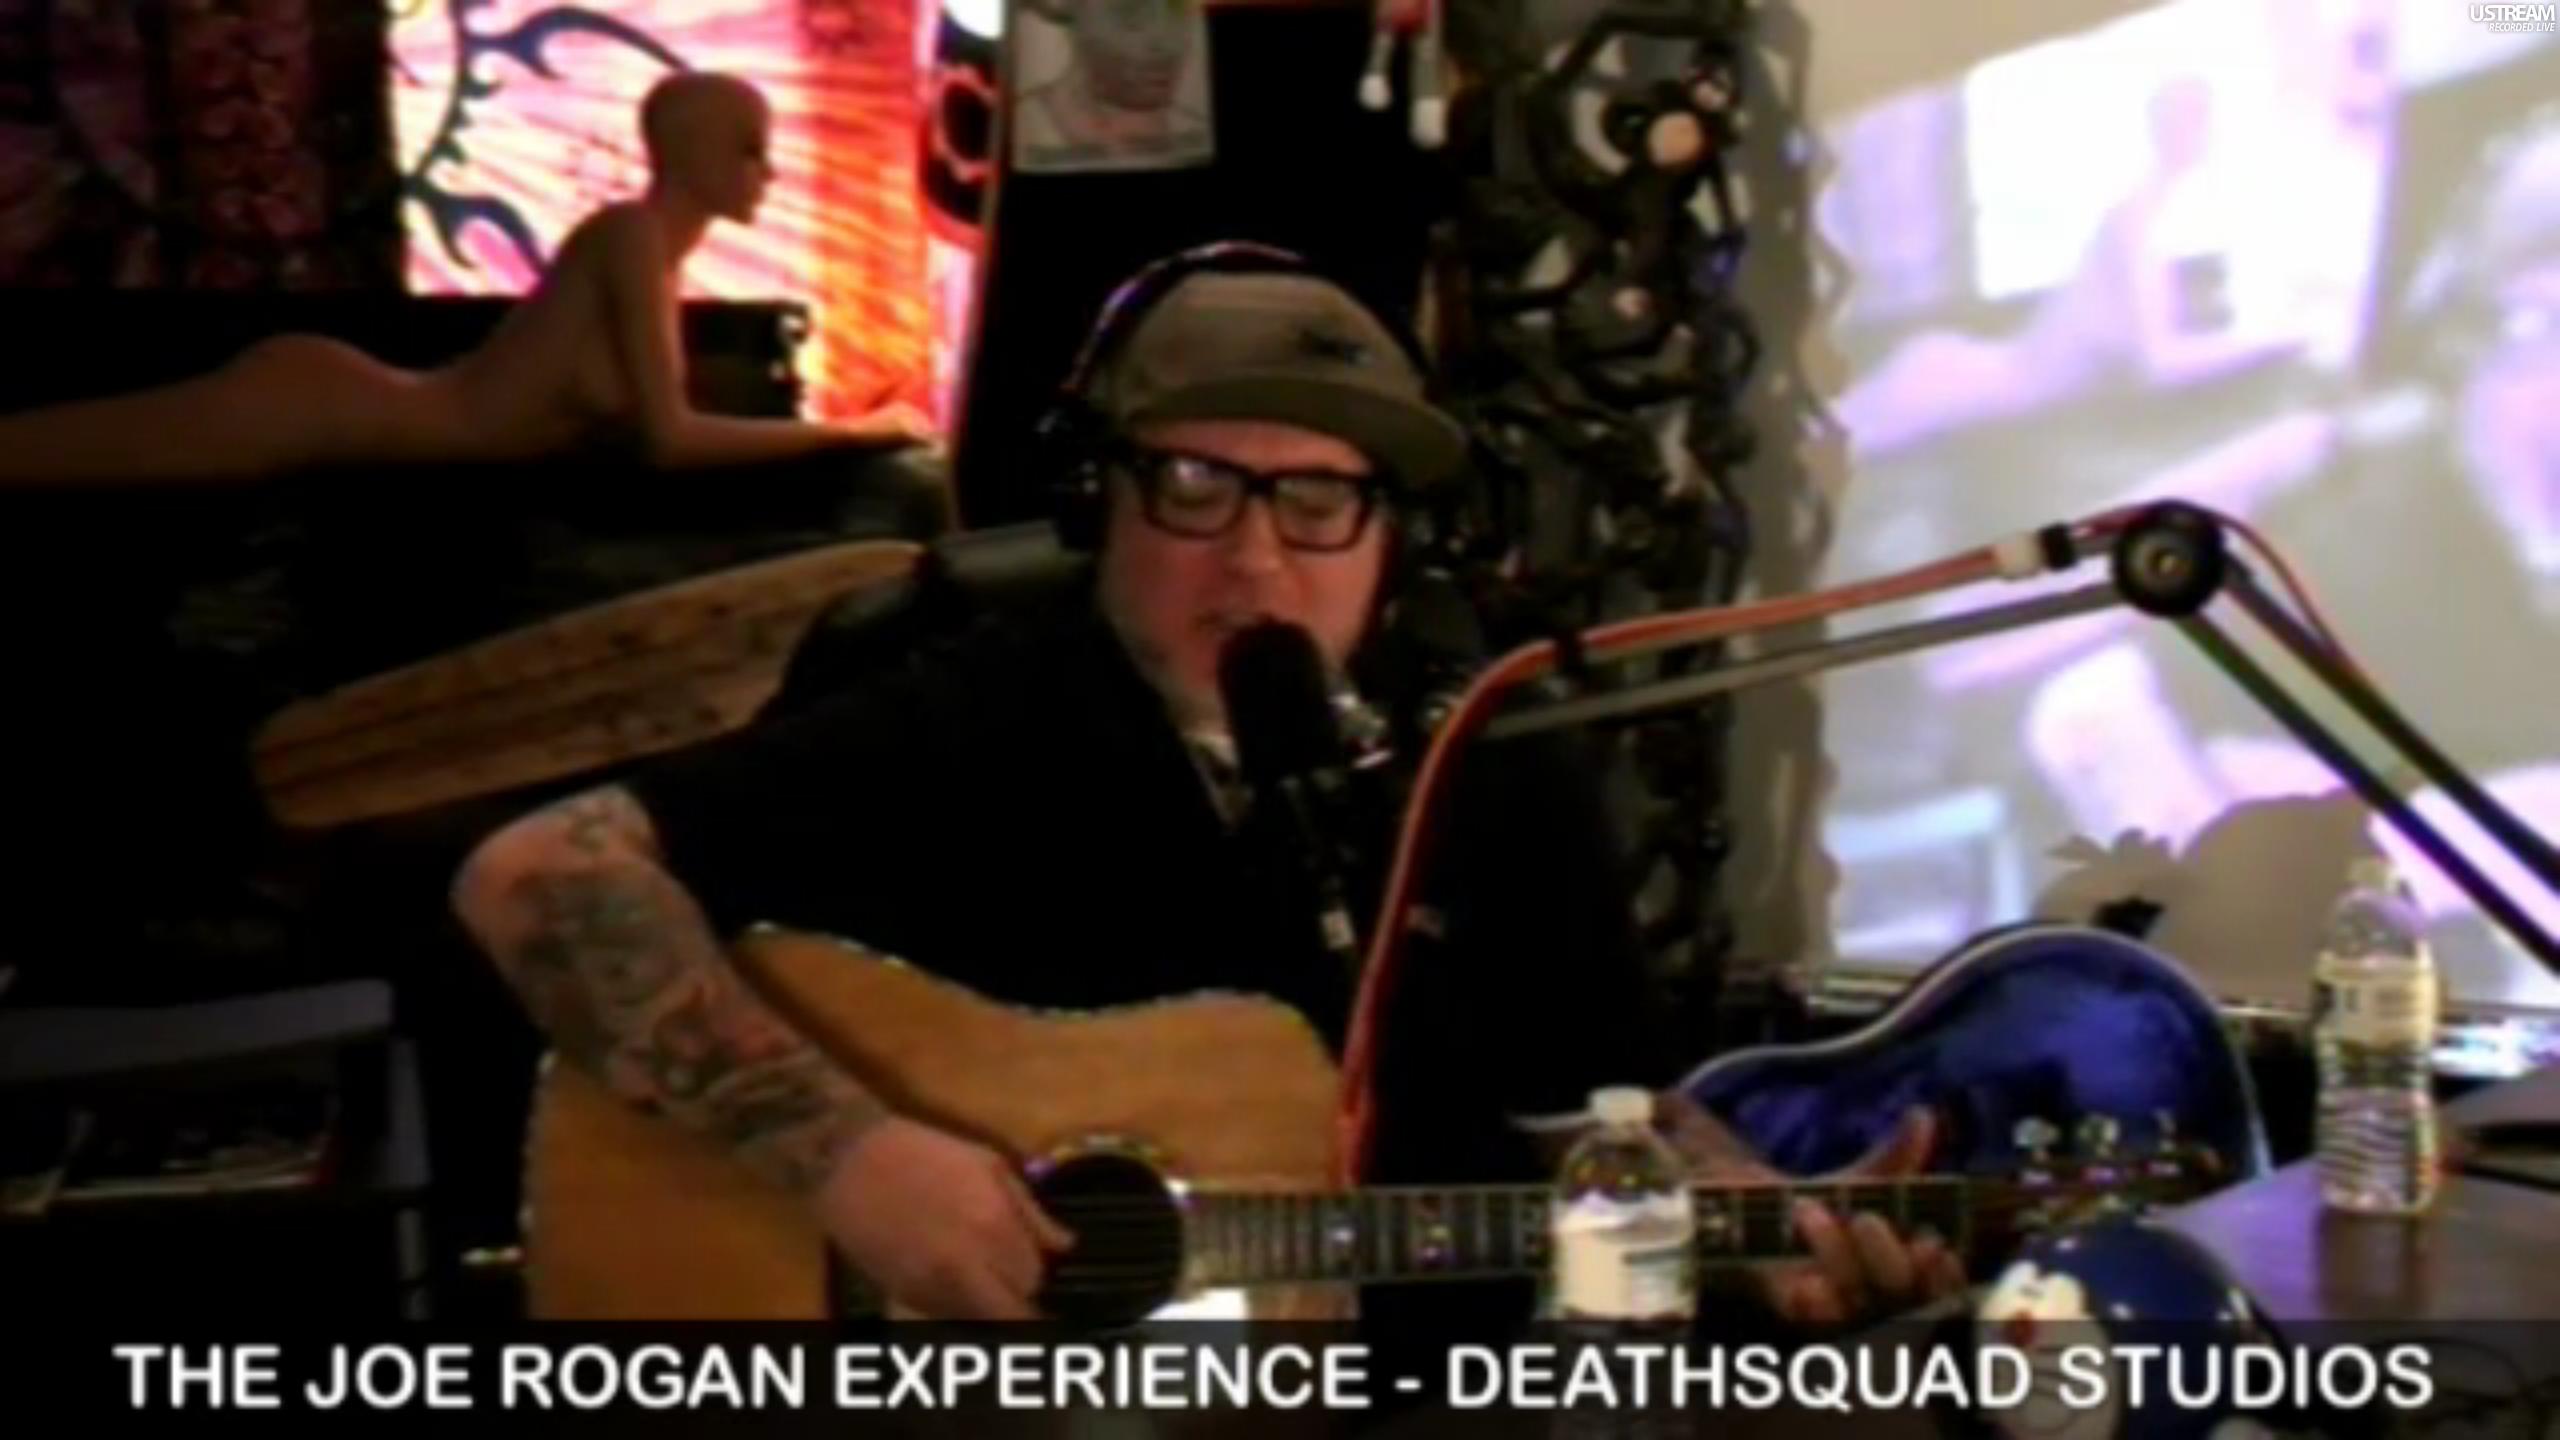 The Joe Rogan Experience #201 - EverLast, Brian Redban